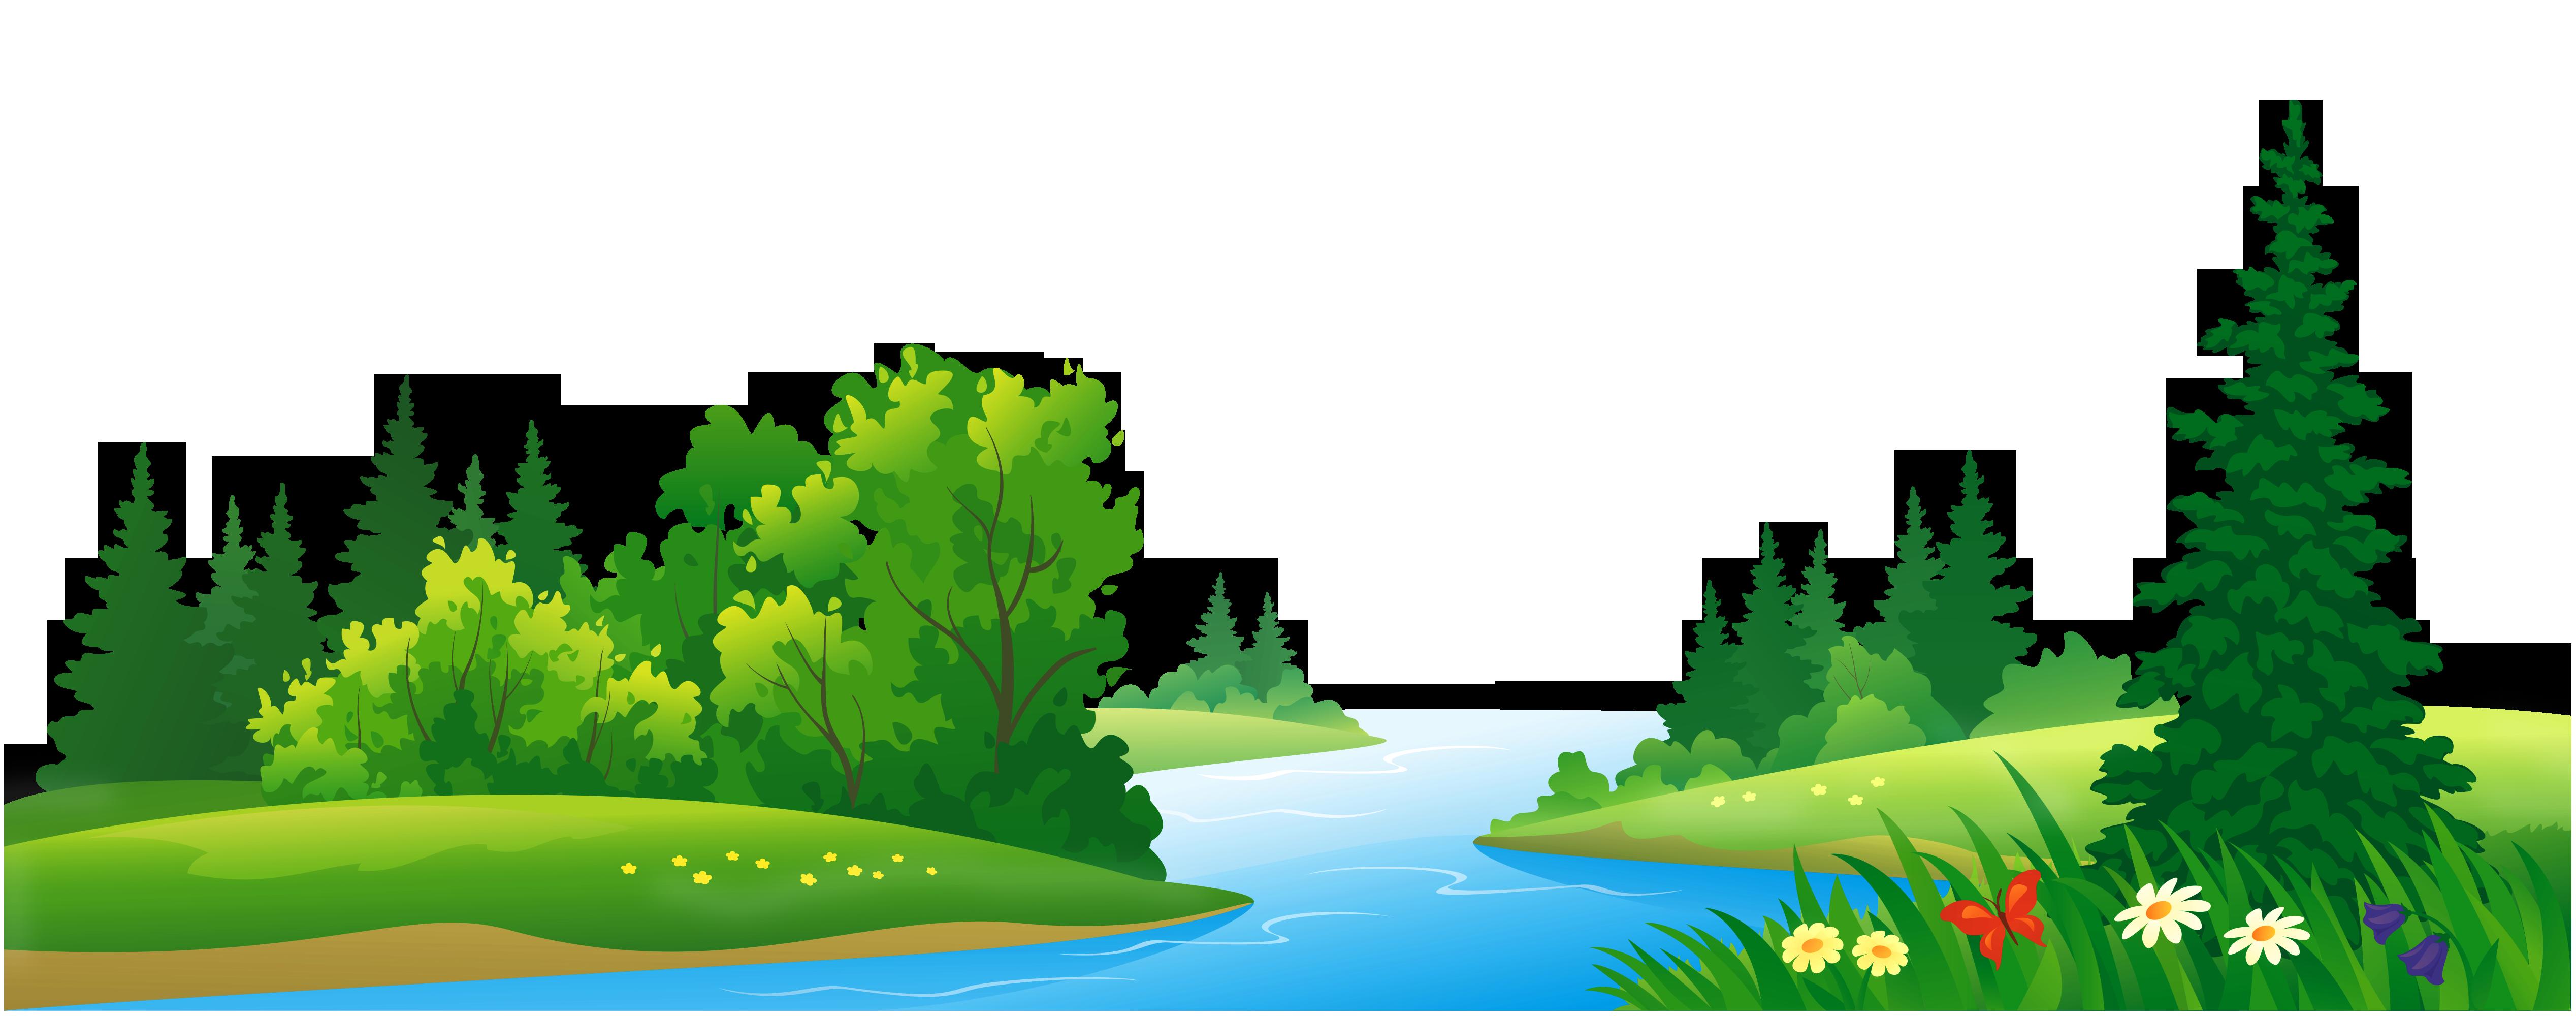 clip art transparent stock Park google nature pinterest. Landscaping clipart background.